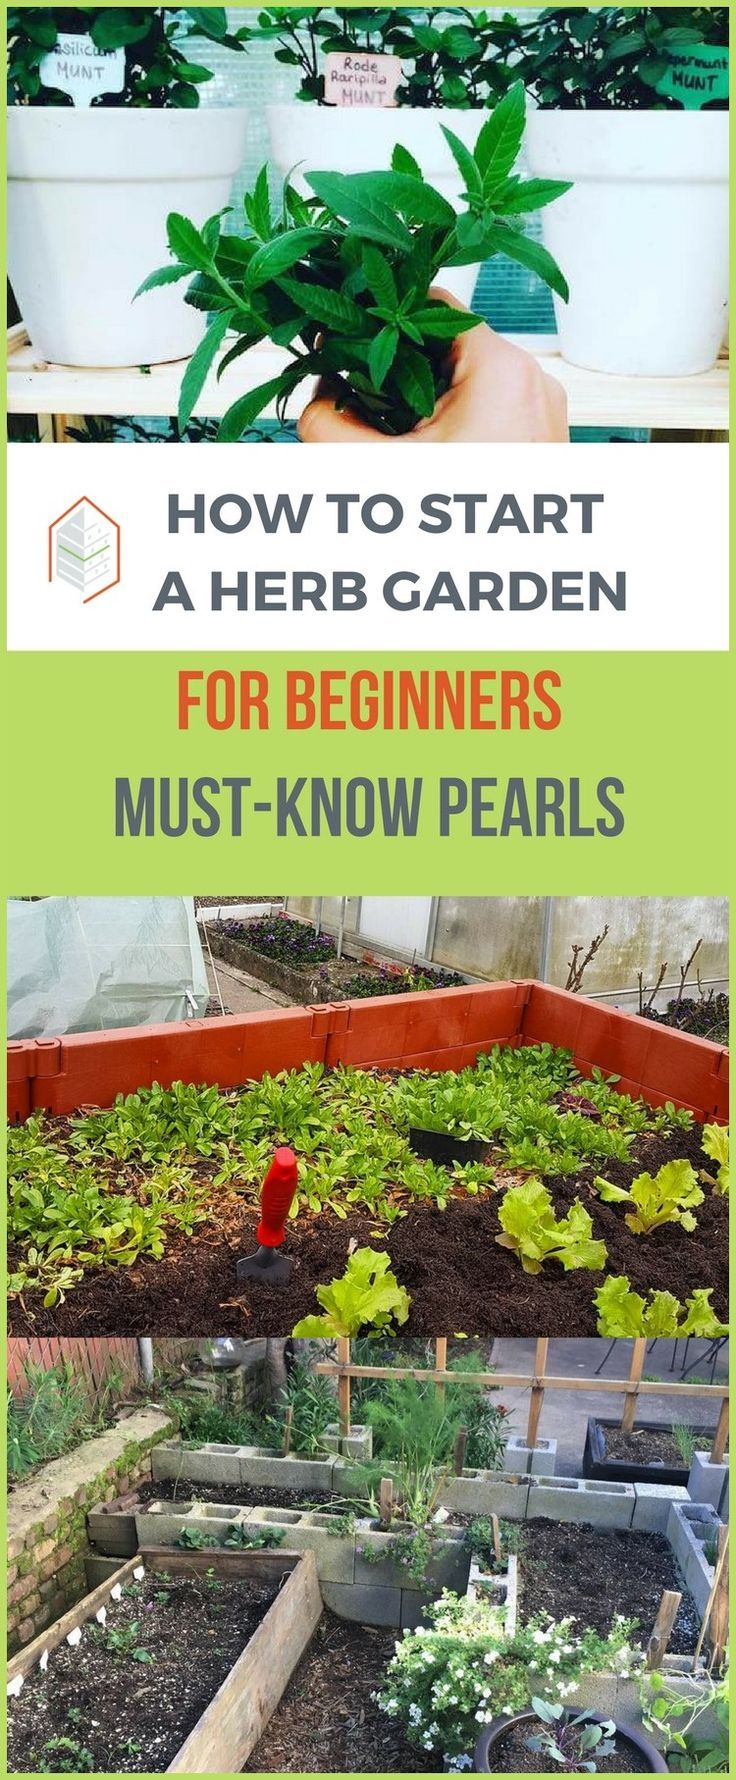 How to Start an Herb Garden for Beginners: Useful Tips ...